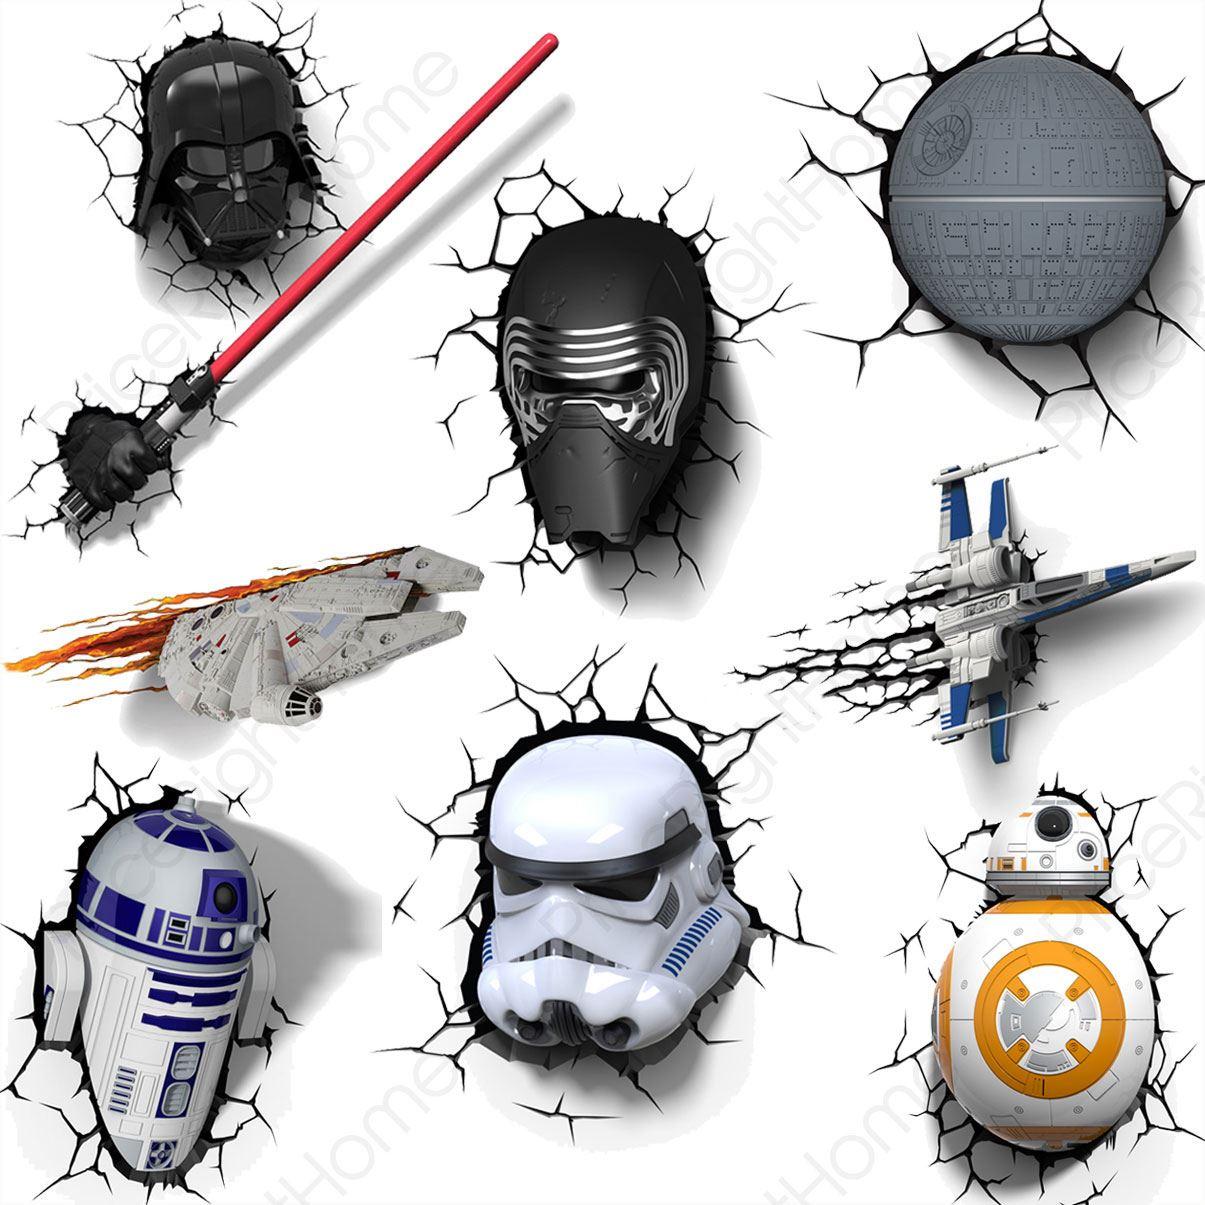 Star wars episode vii 3d wall lights ã¢â€â bb 8 stormtrooper r2 d2 light saber